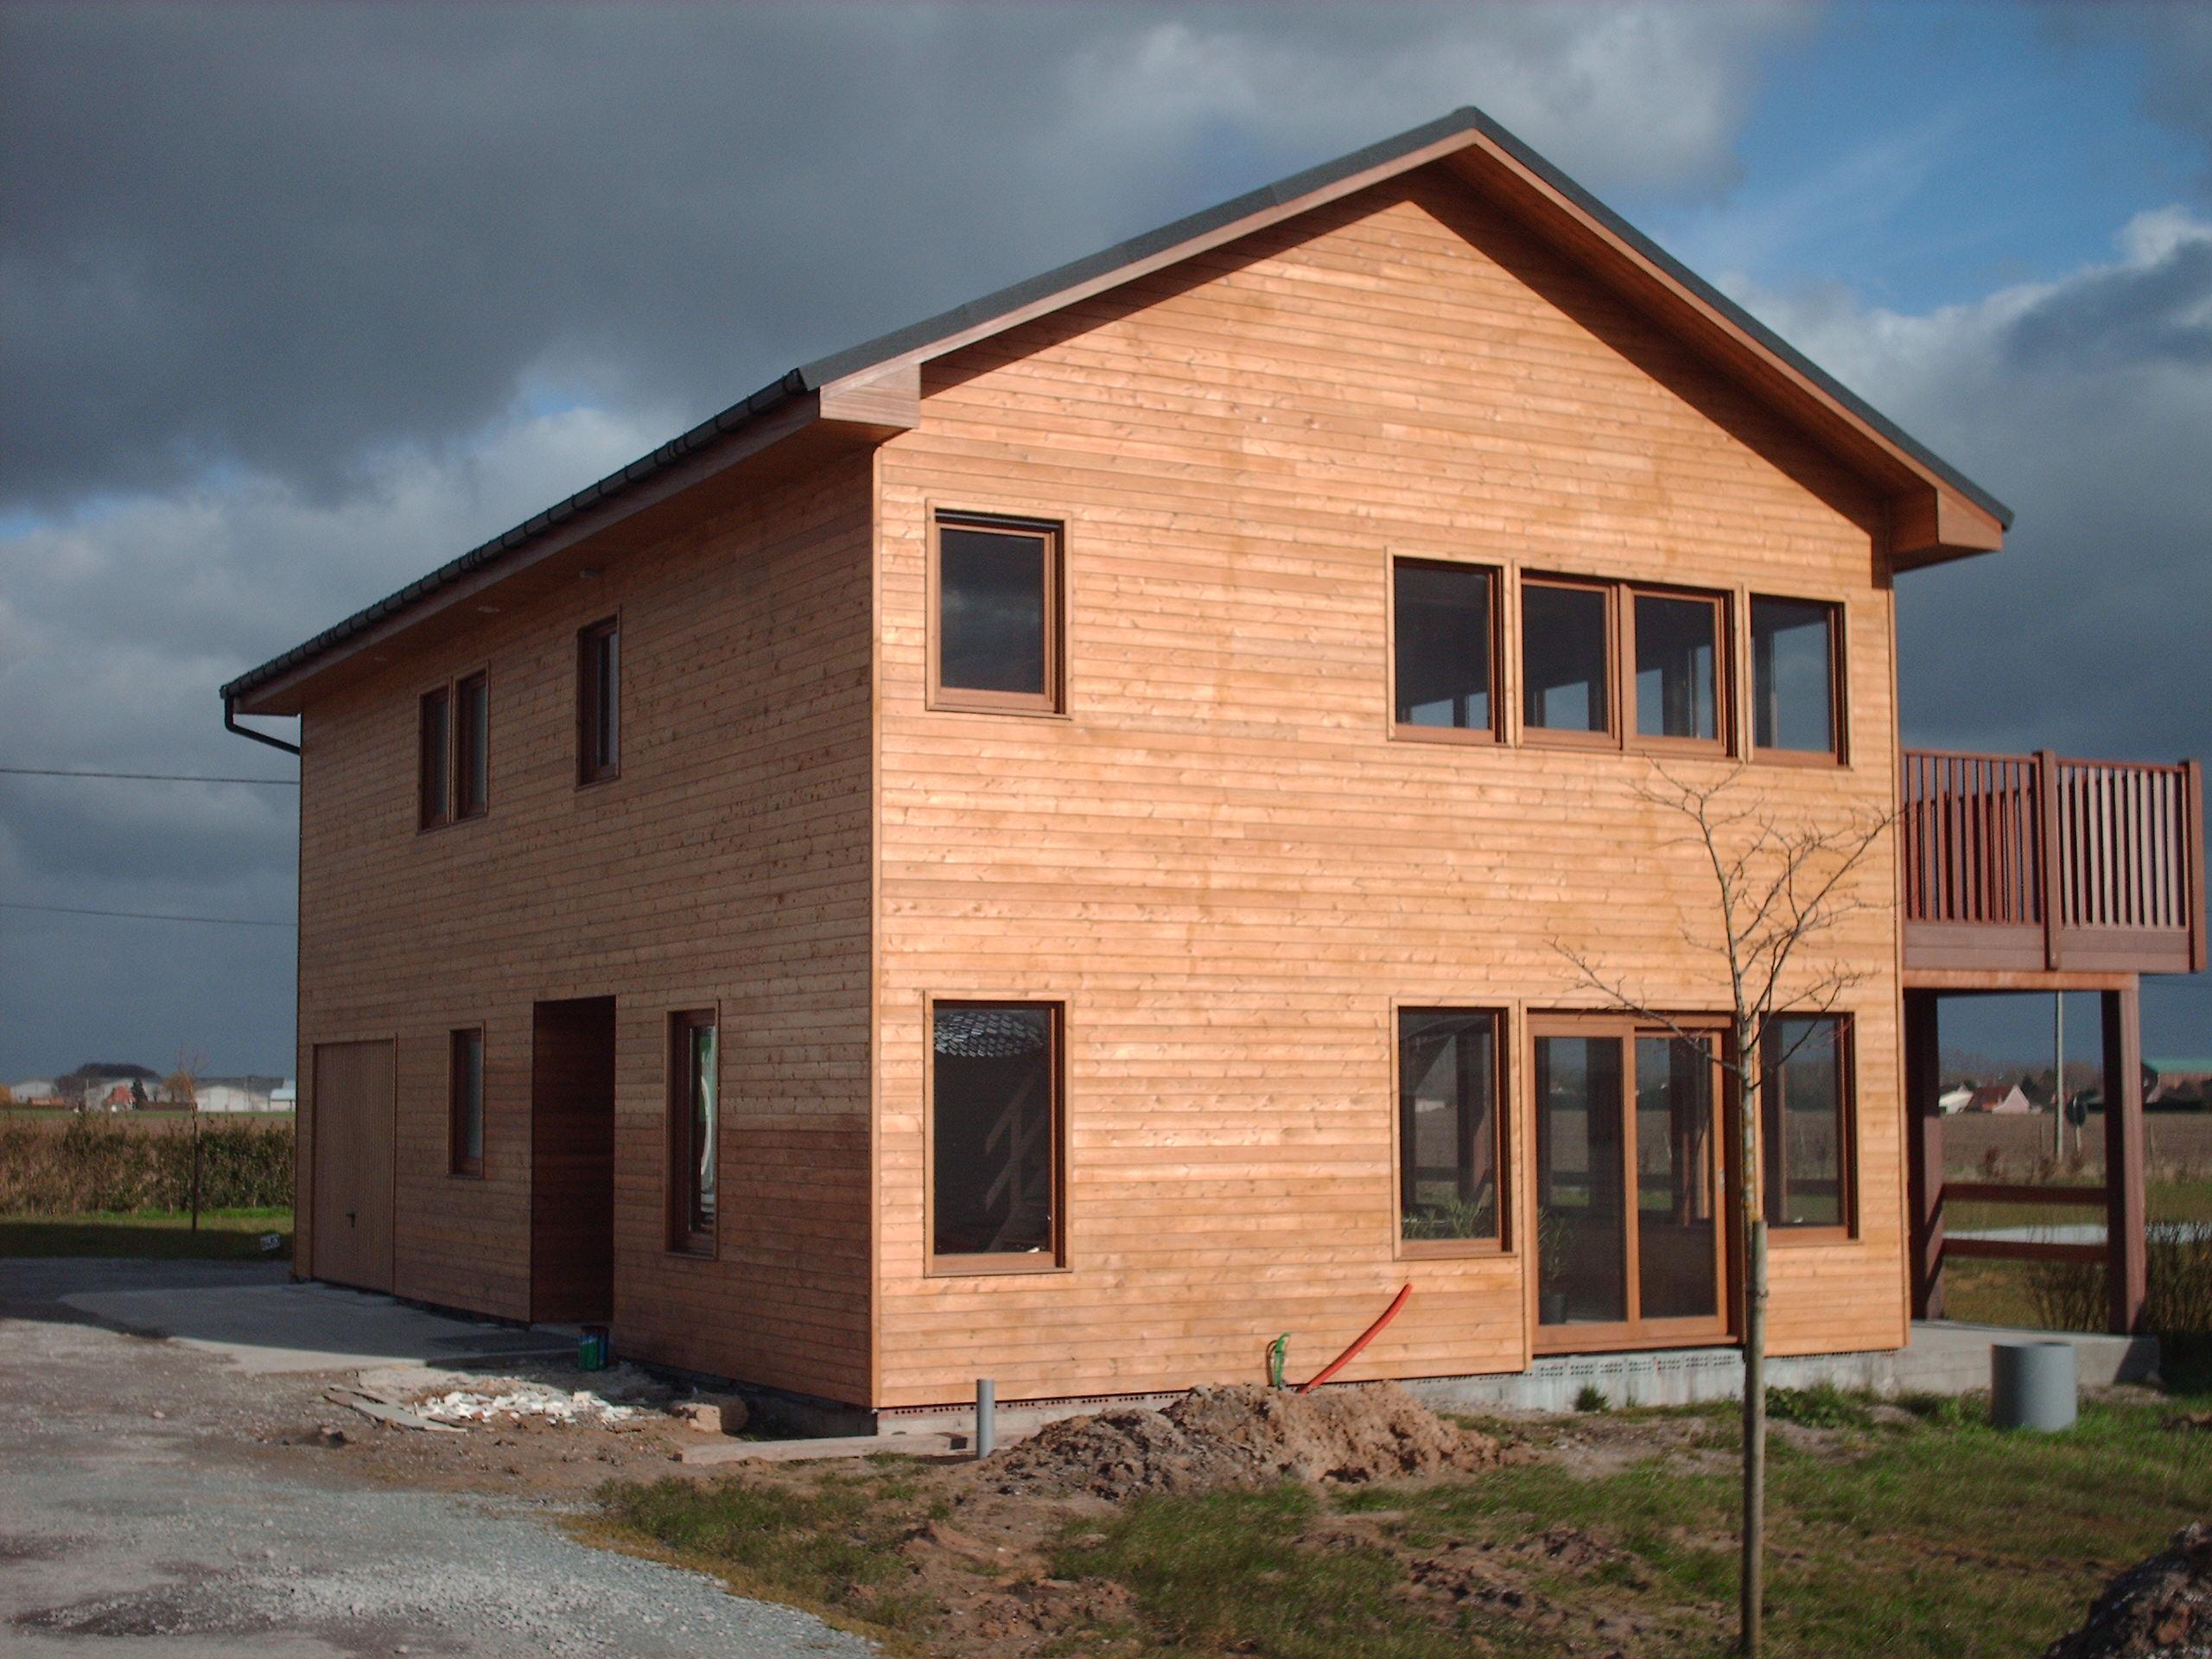 Chalet houten woning daniel decadt houten constructies houthandel proven - Interieur chalet houten berg ...